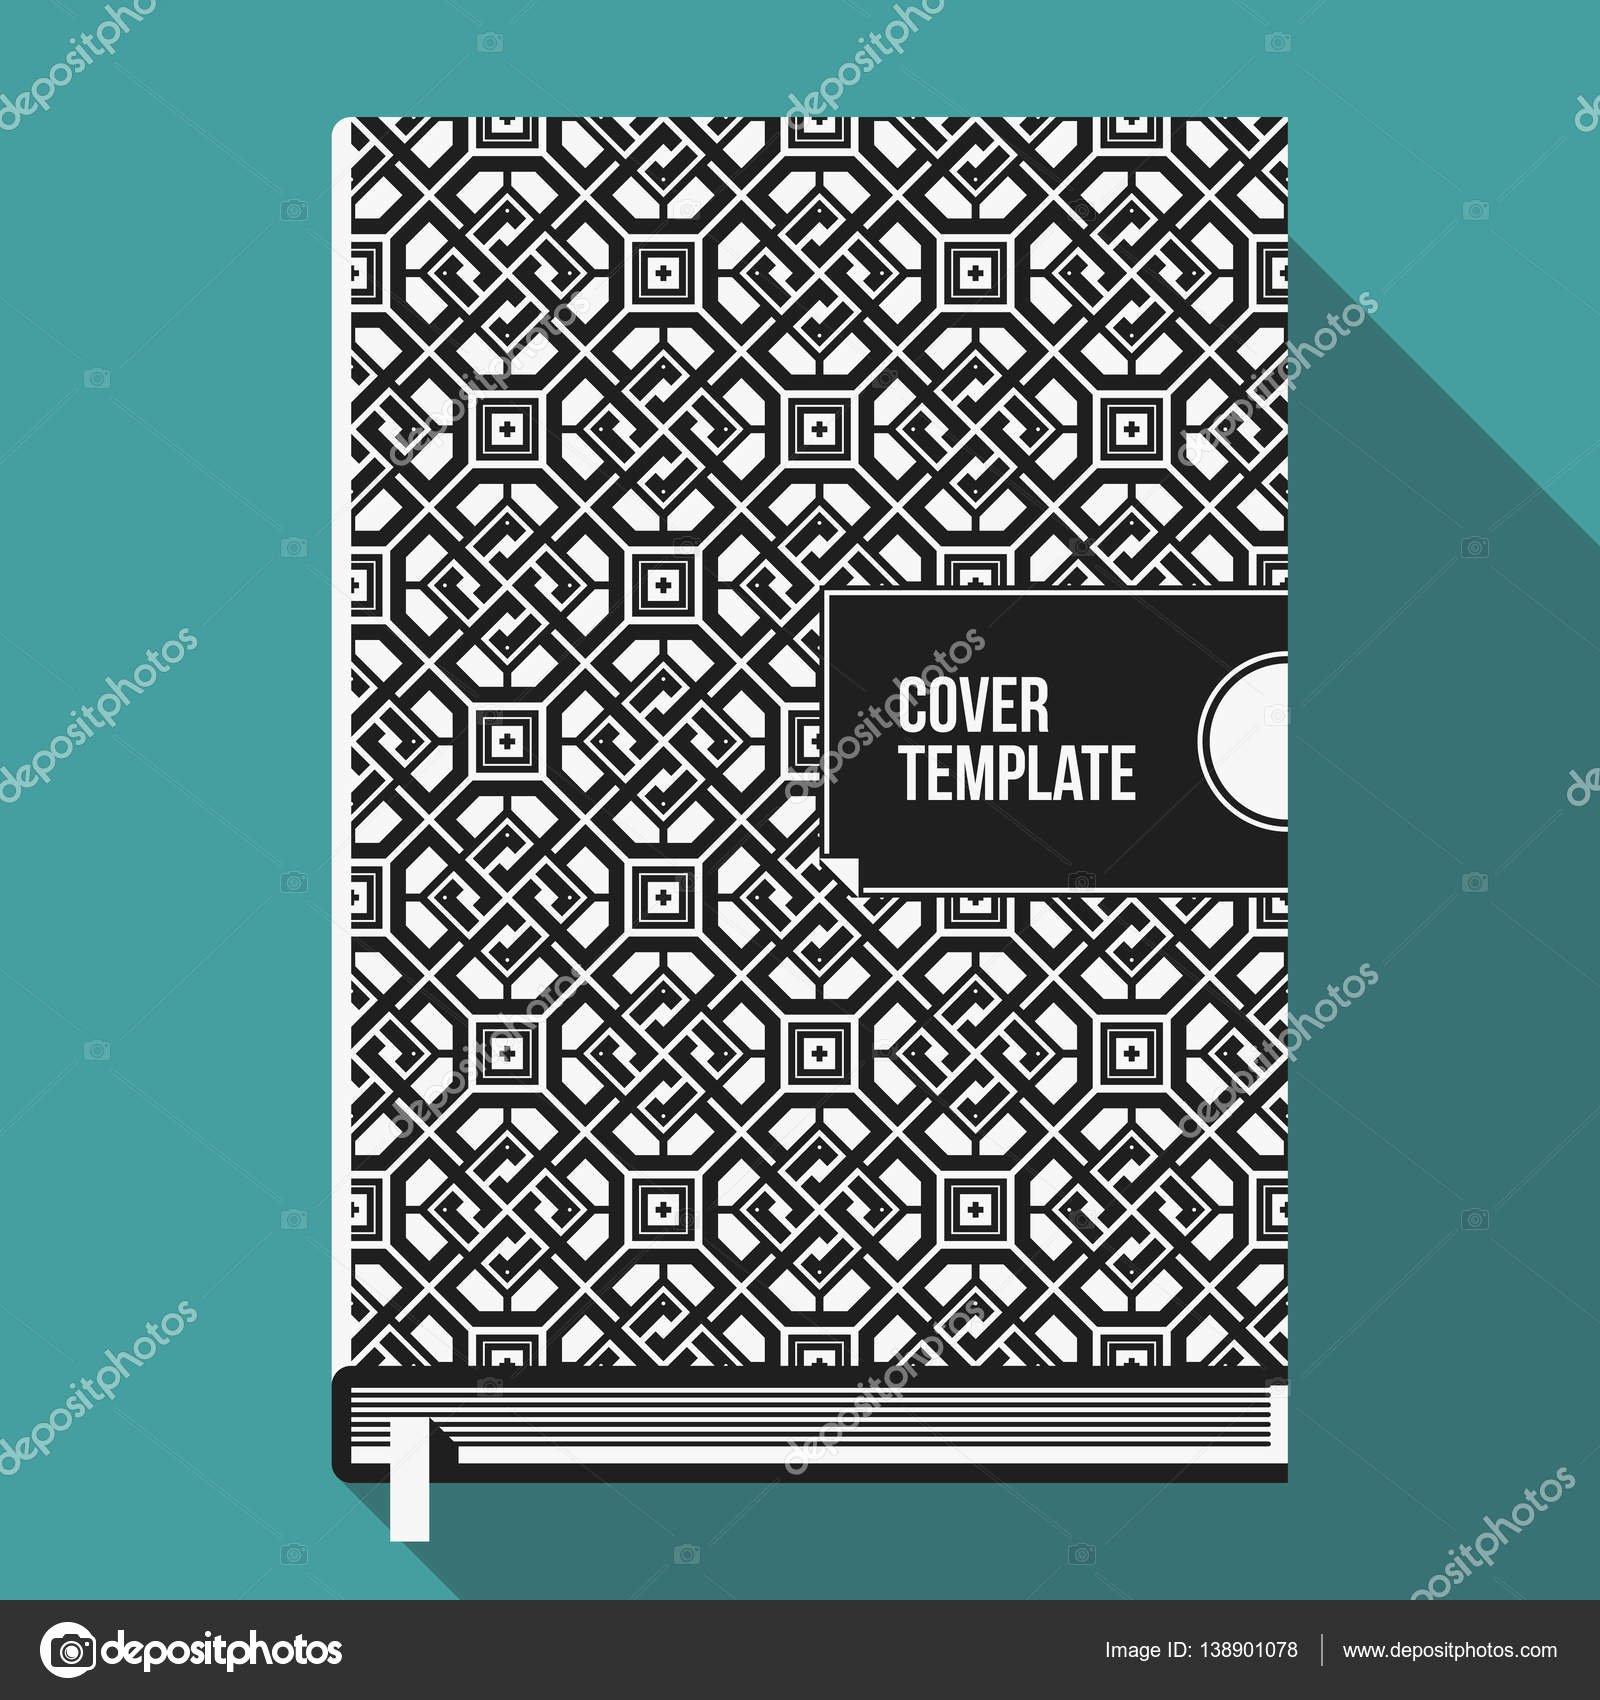 Book Cover Template Illustrator Elegant Szablon Projektu Okładki Książki Z Monochromatycznym Wzór